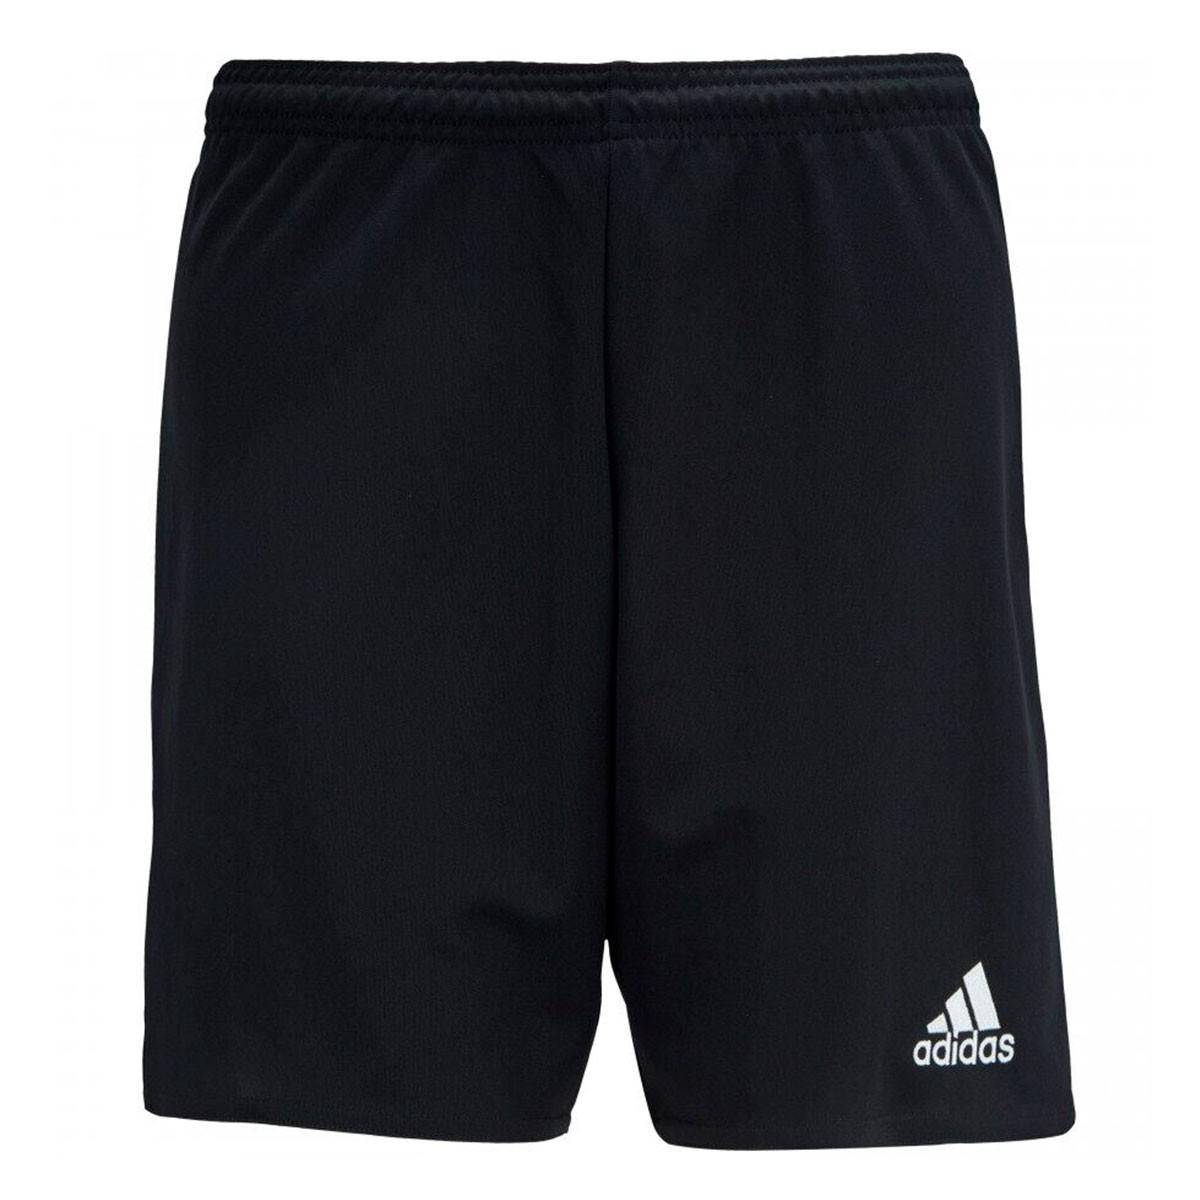 Short Adidas Parma Masculino Preto